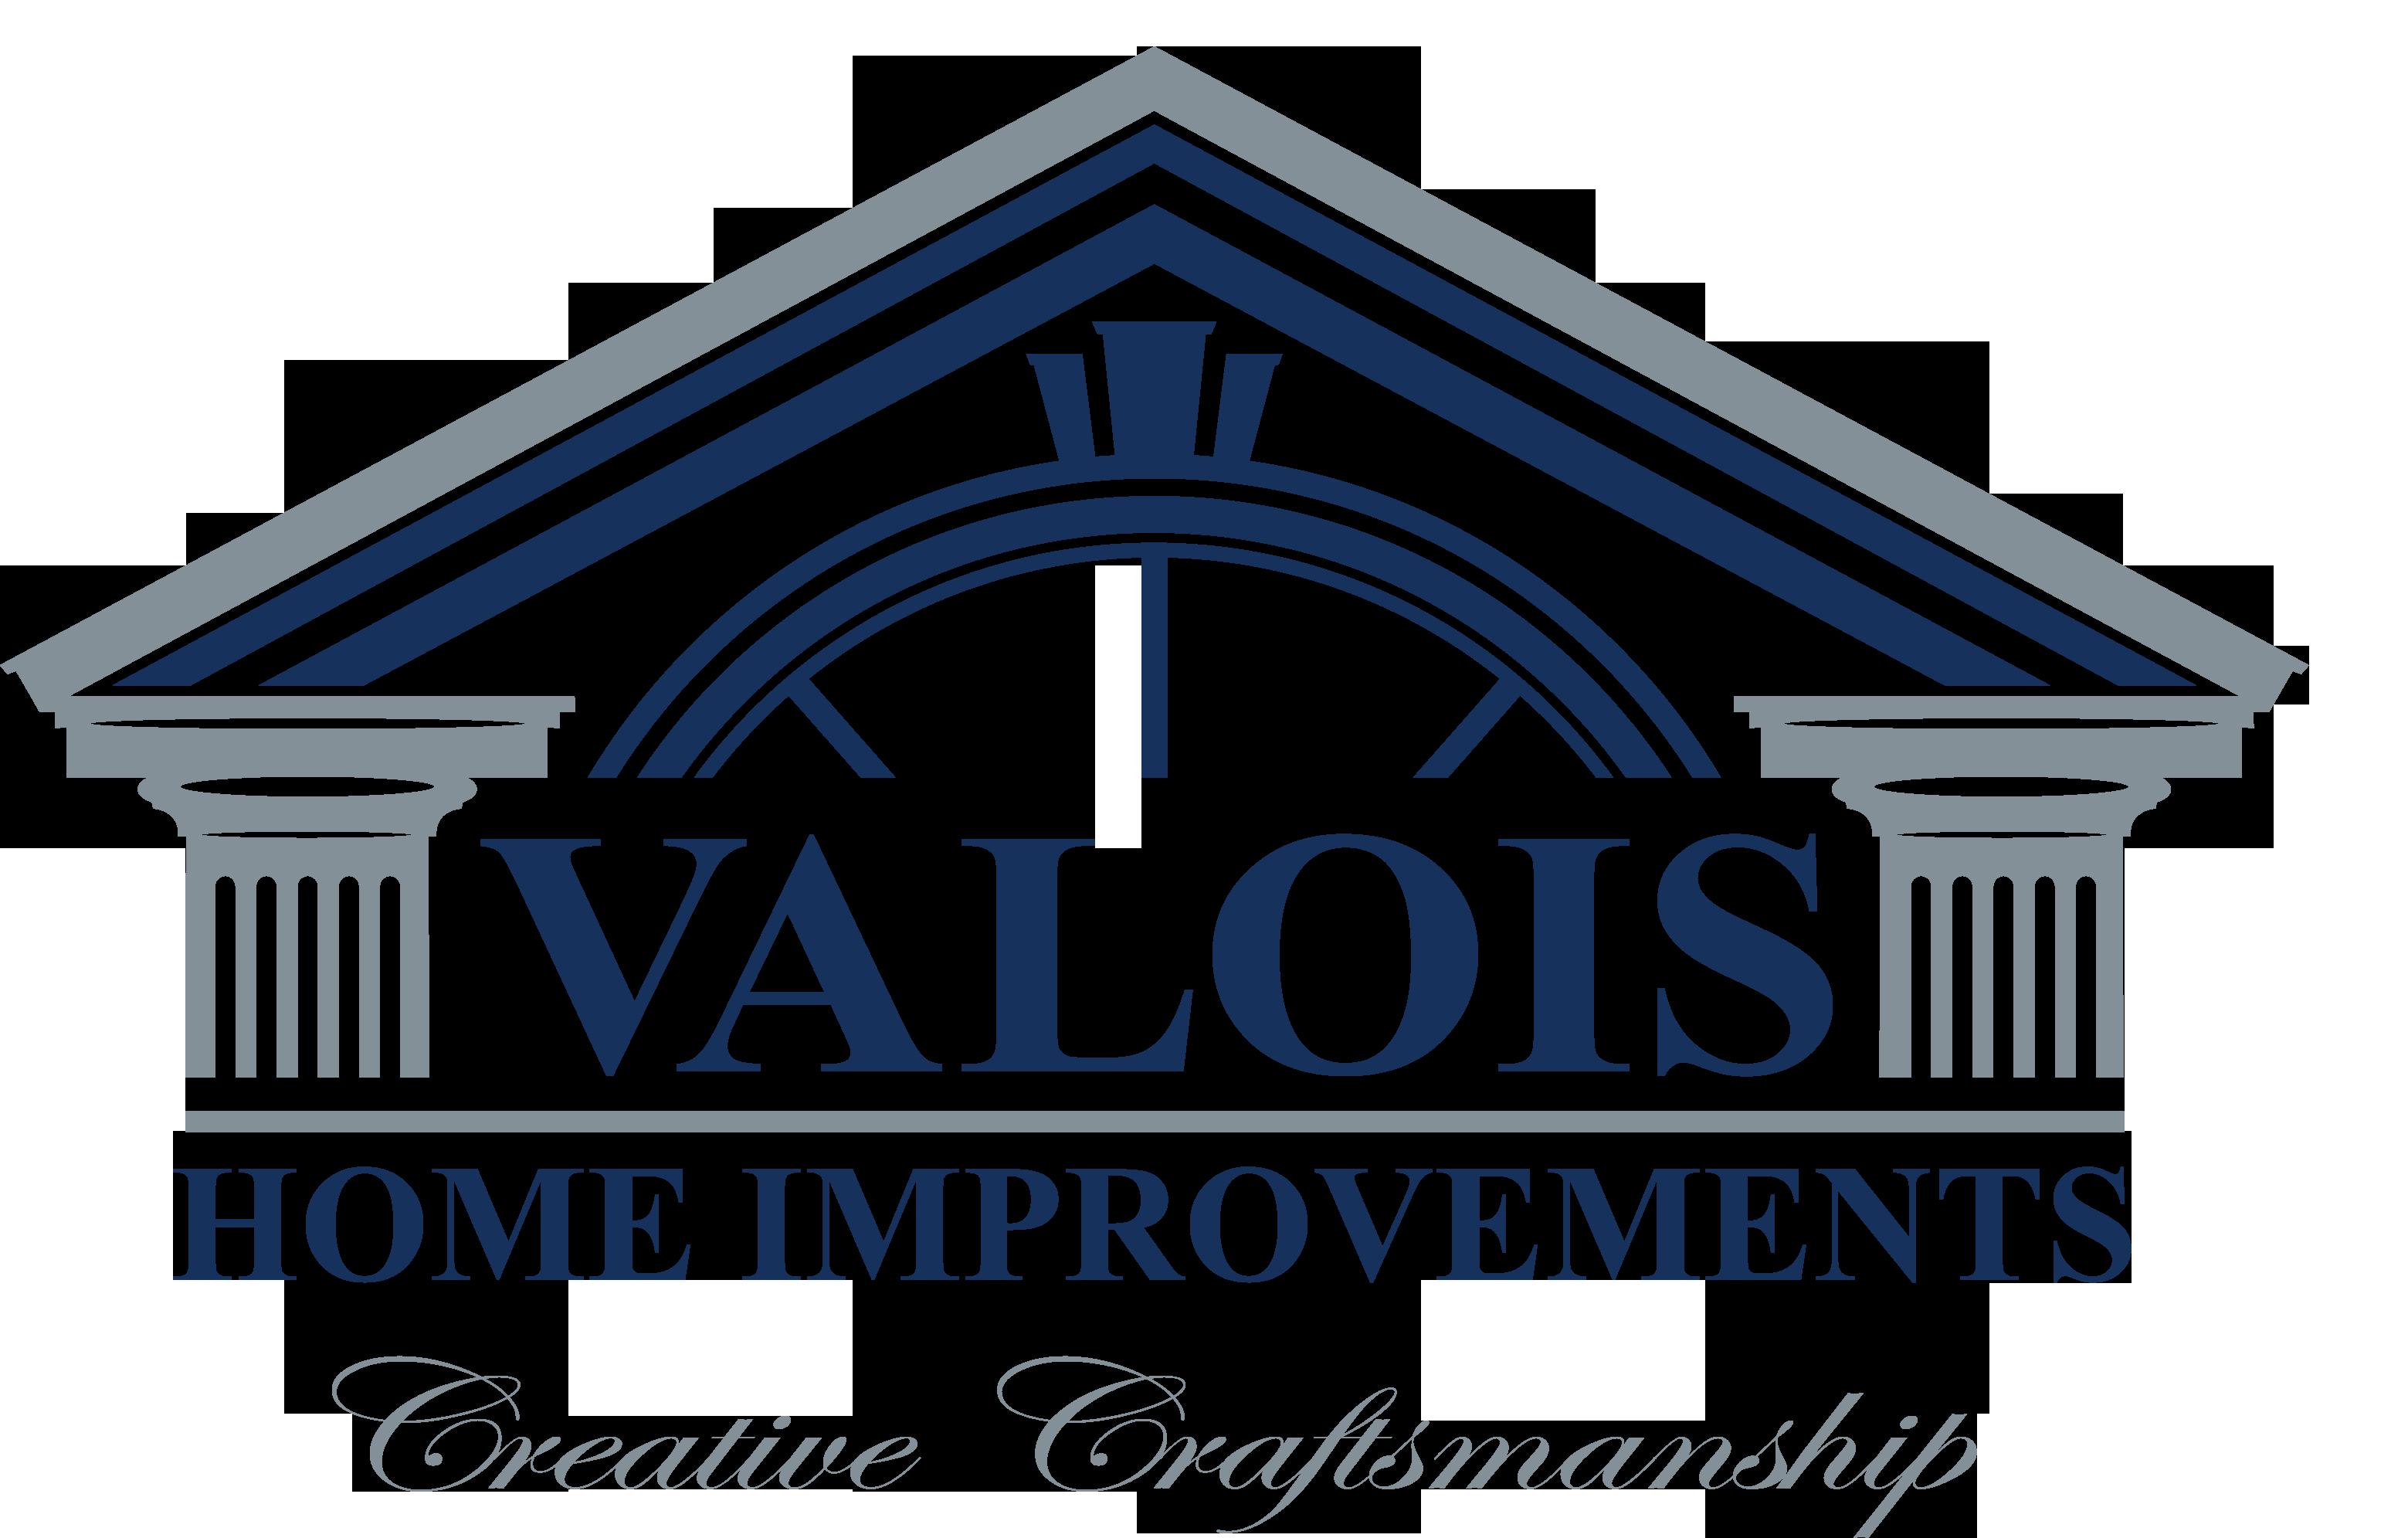 Valois Home Improvements